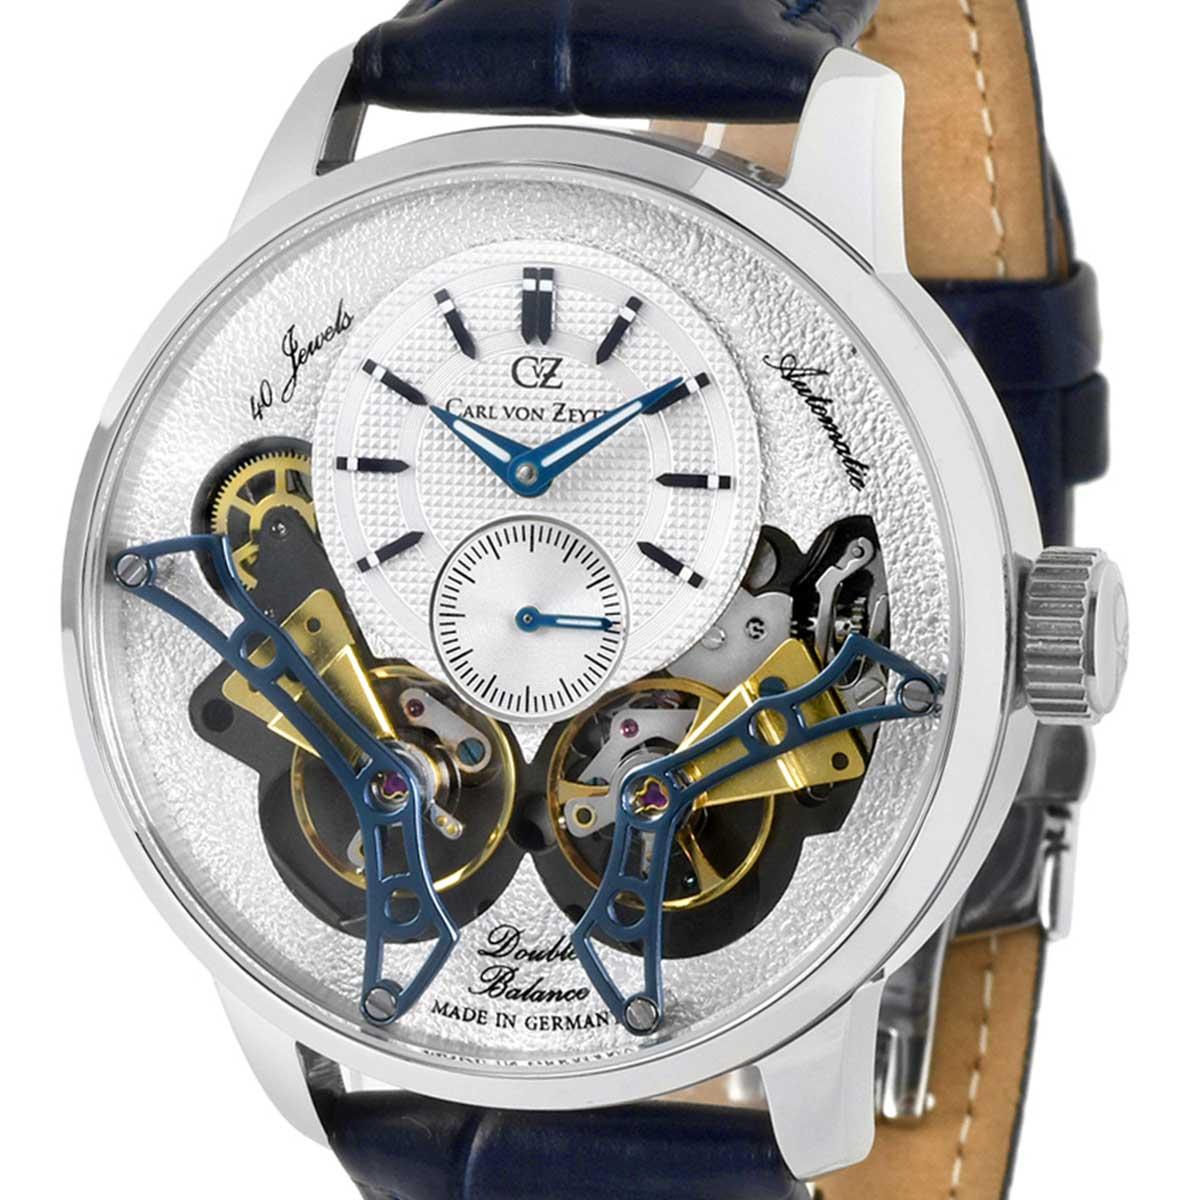 Carl von Zeyten カール・フォン・ツォイテン 自動巻き(手巻き機能あり) 腕時計 [CvZ0064WH] 正規代理店品